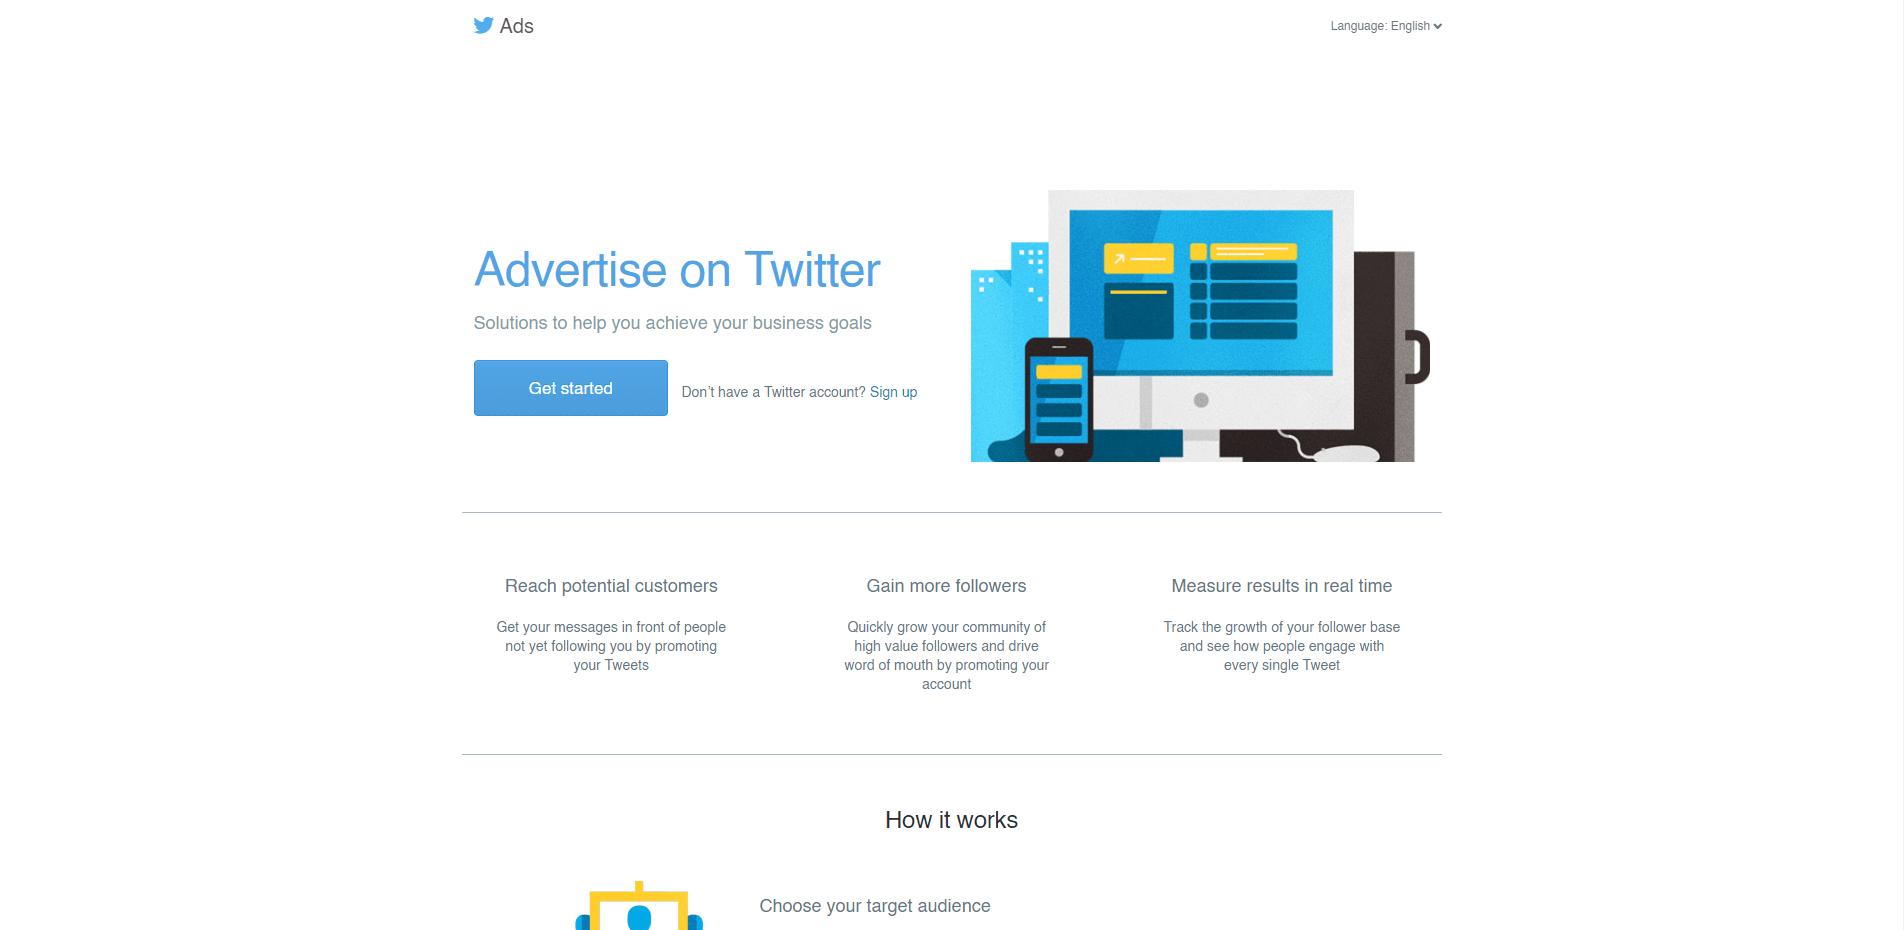 5. Twitter Ads